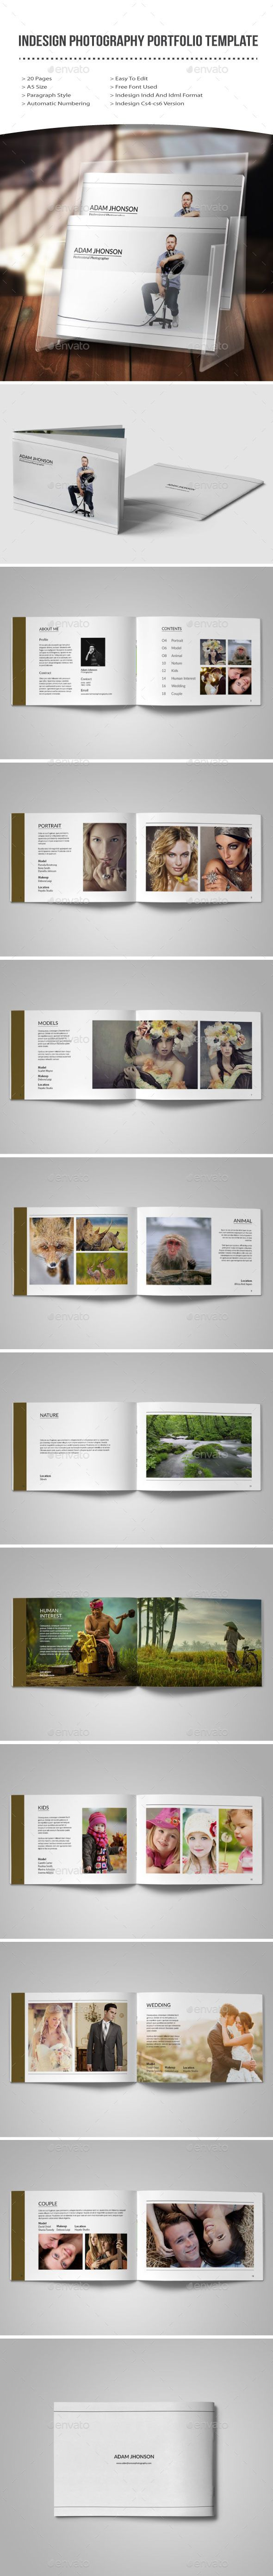 Indesign photography portfolio template